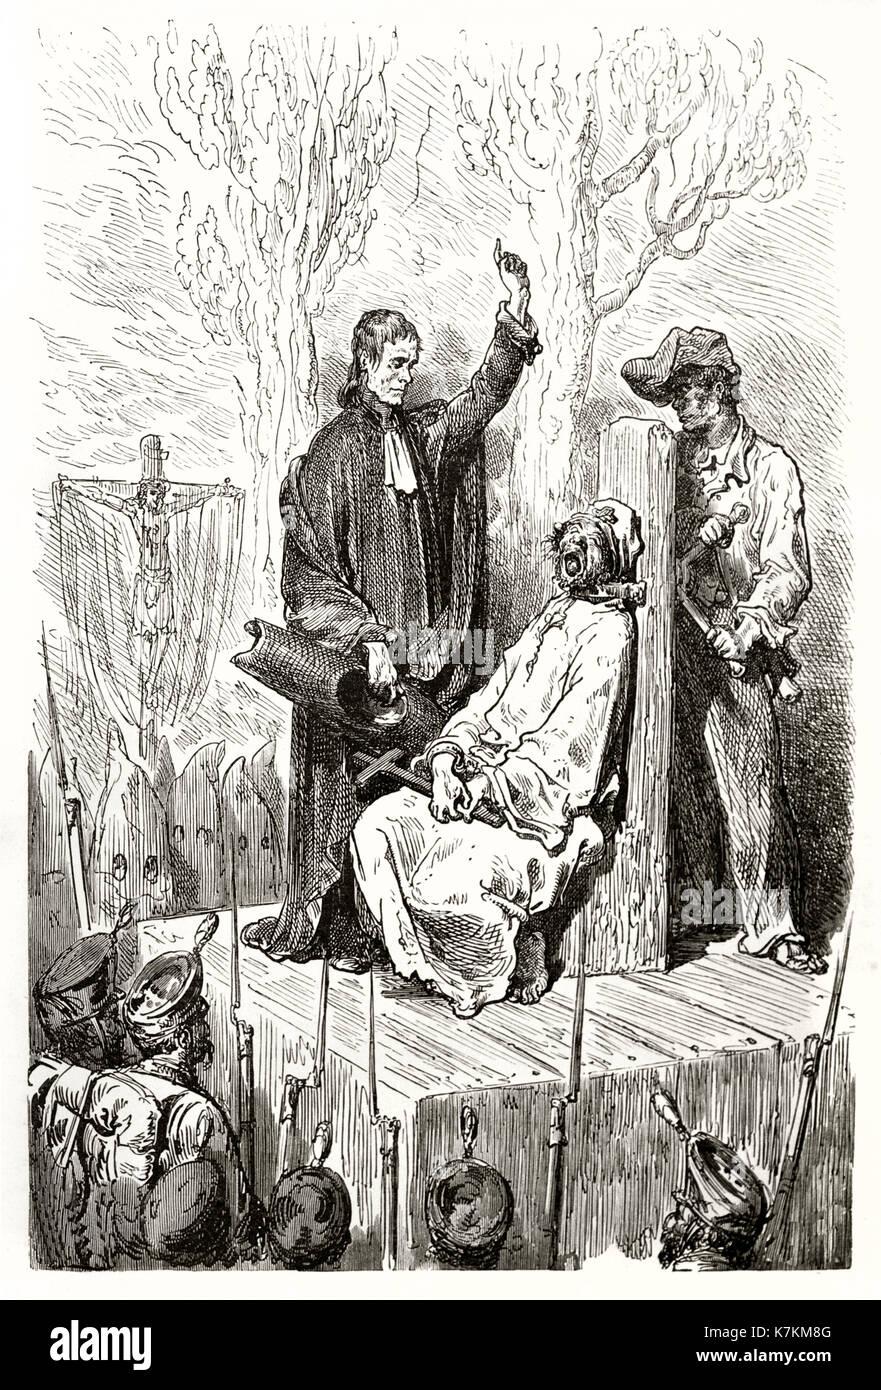 Old illustration depicting death penalty by garrote in Spain. By Dore, publ. on Le Tour du Monde, Paris, 1862 - Stock Image